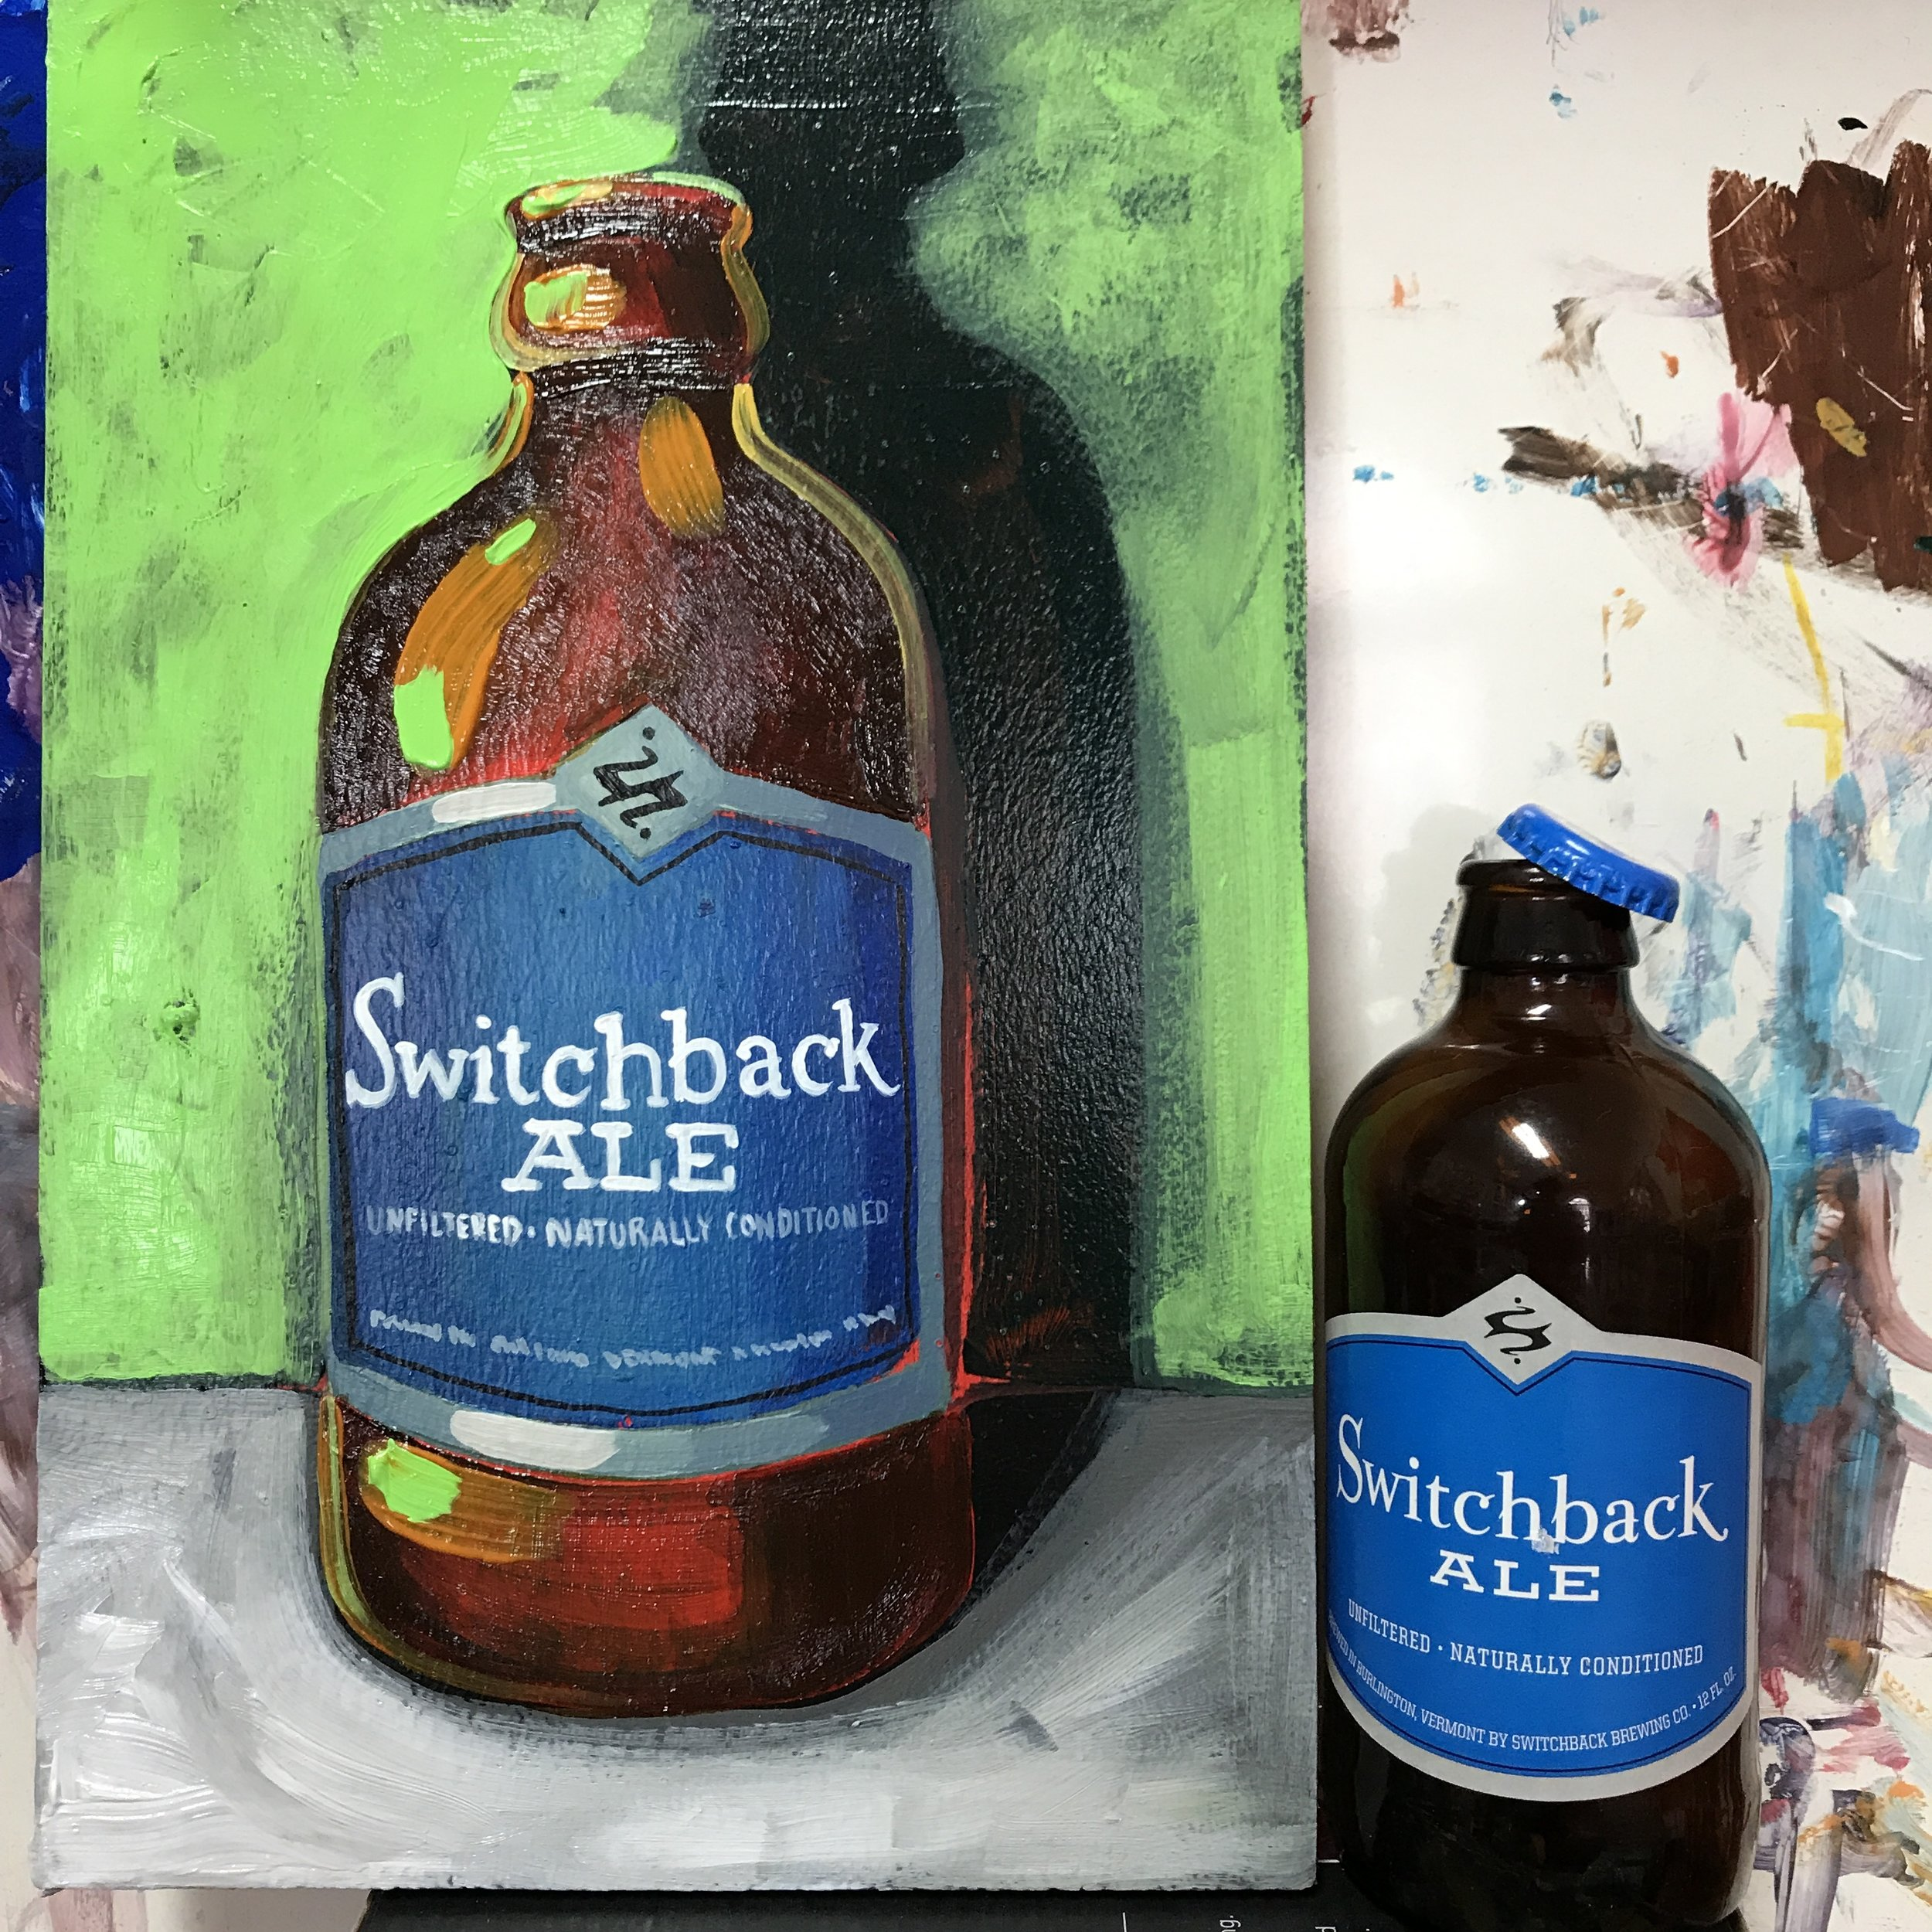 58 Switchback Ale (USA)